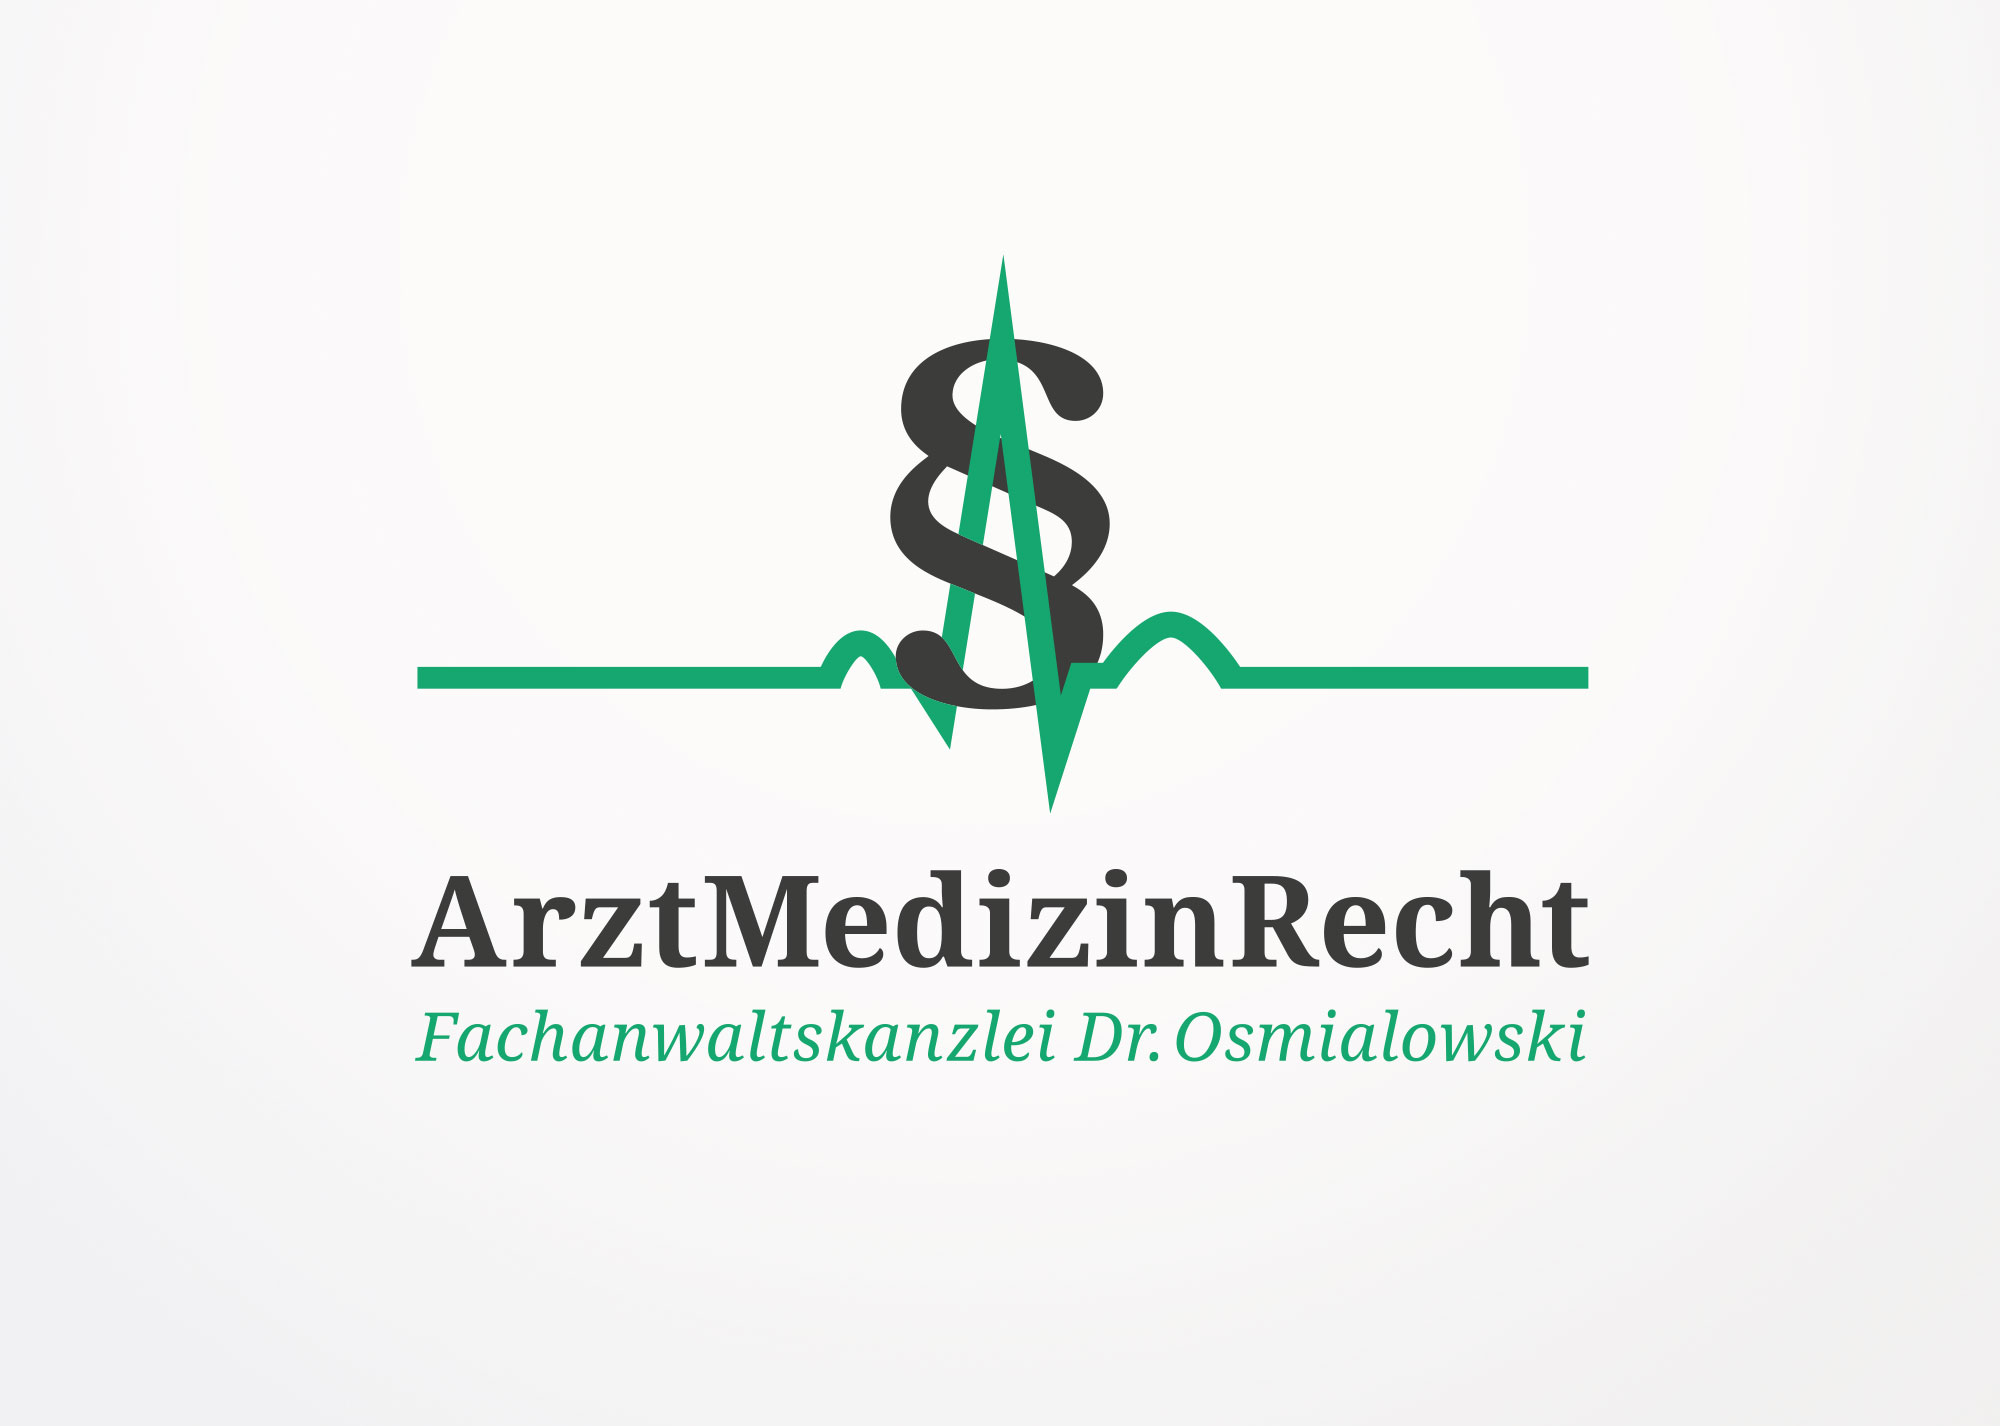 Arzt Medizin Recht Fachanwaltskanzlei Benz Designstudio